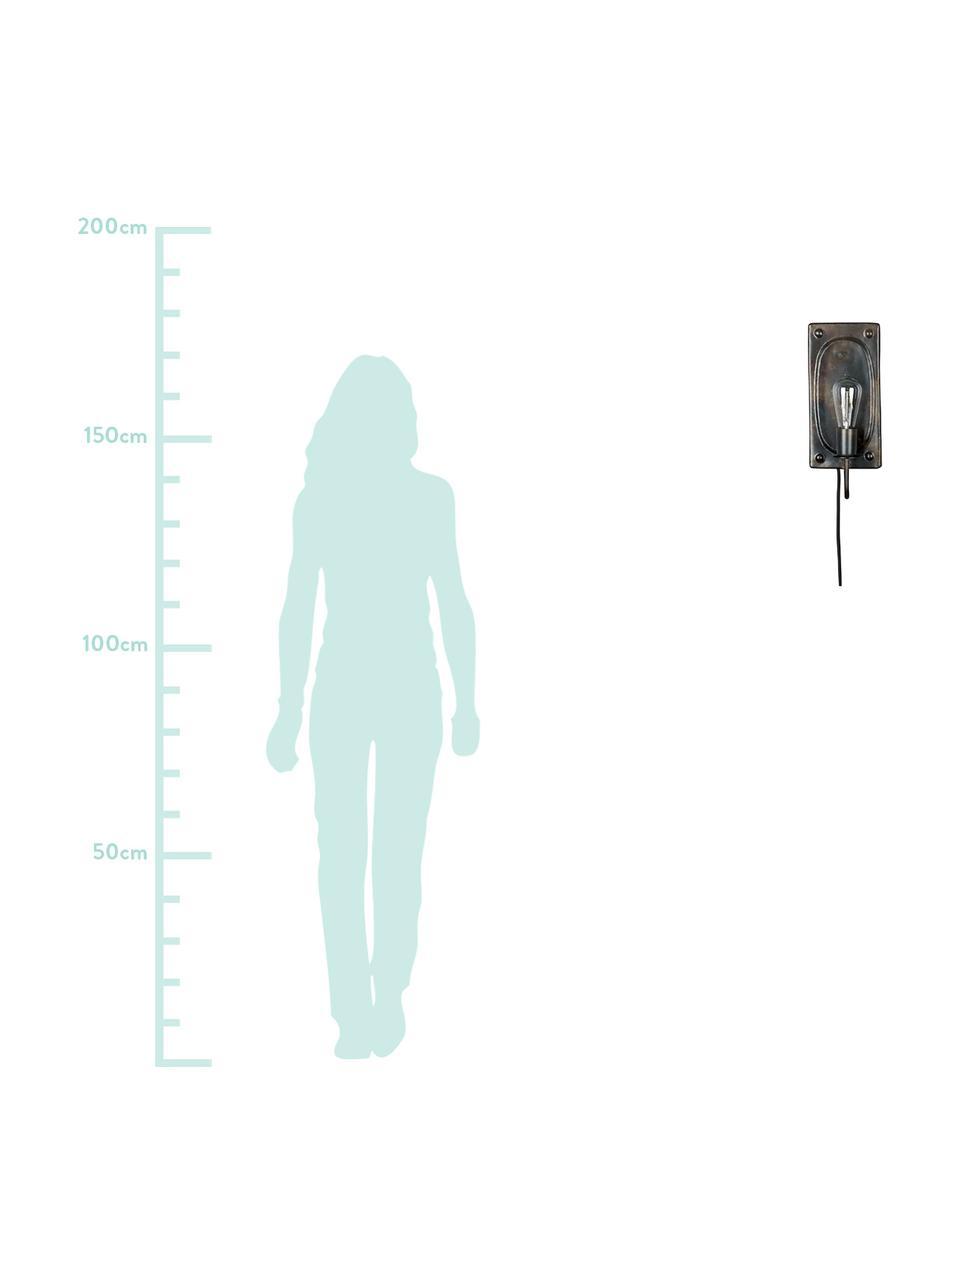 Applique con spina Brody, Marrone scuro, Larg. 16 x Alt. 38 cm